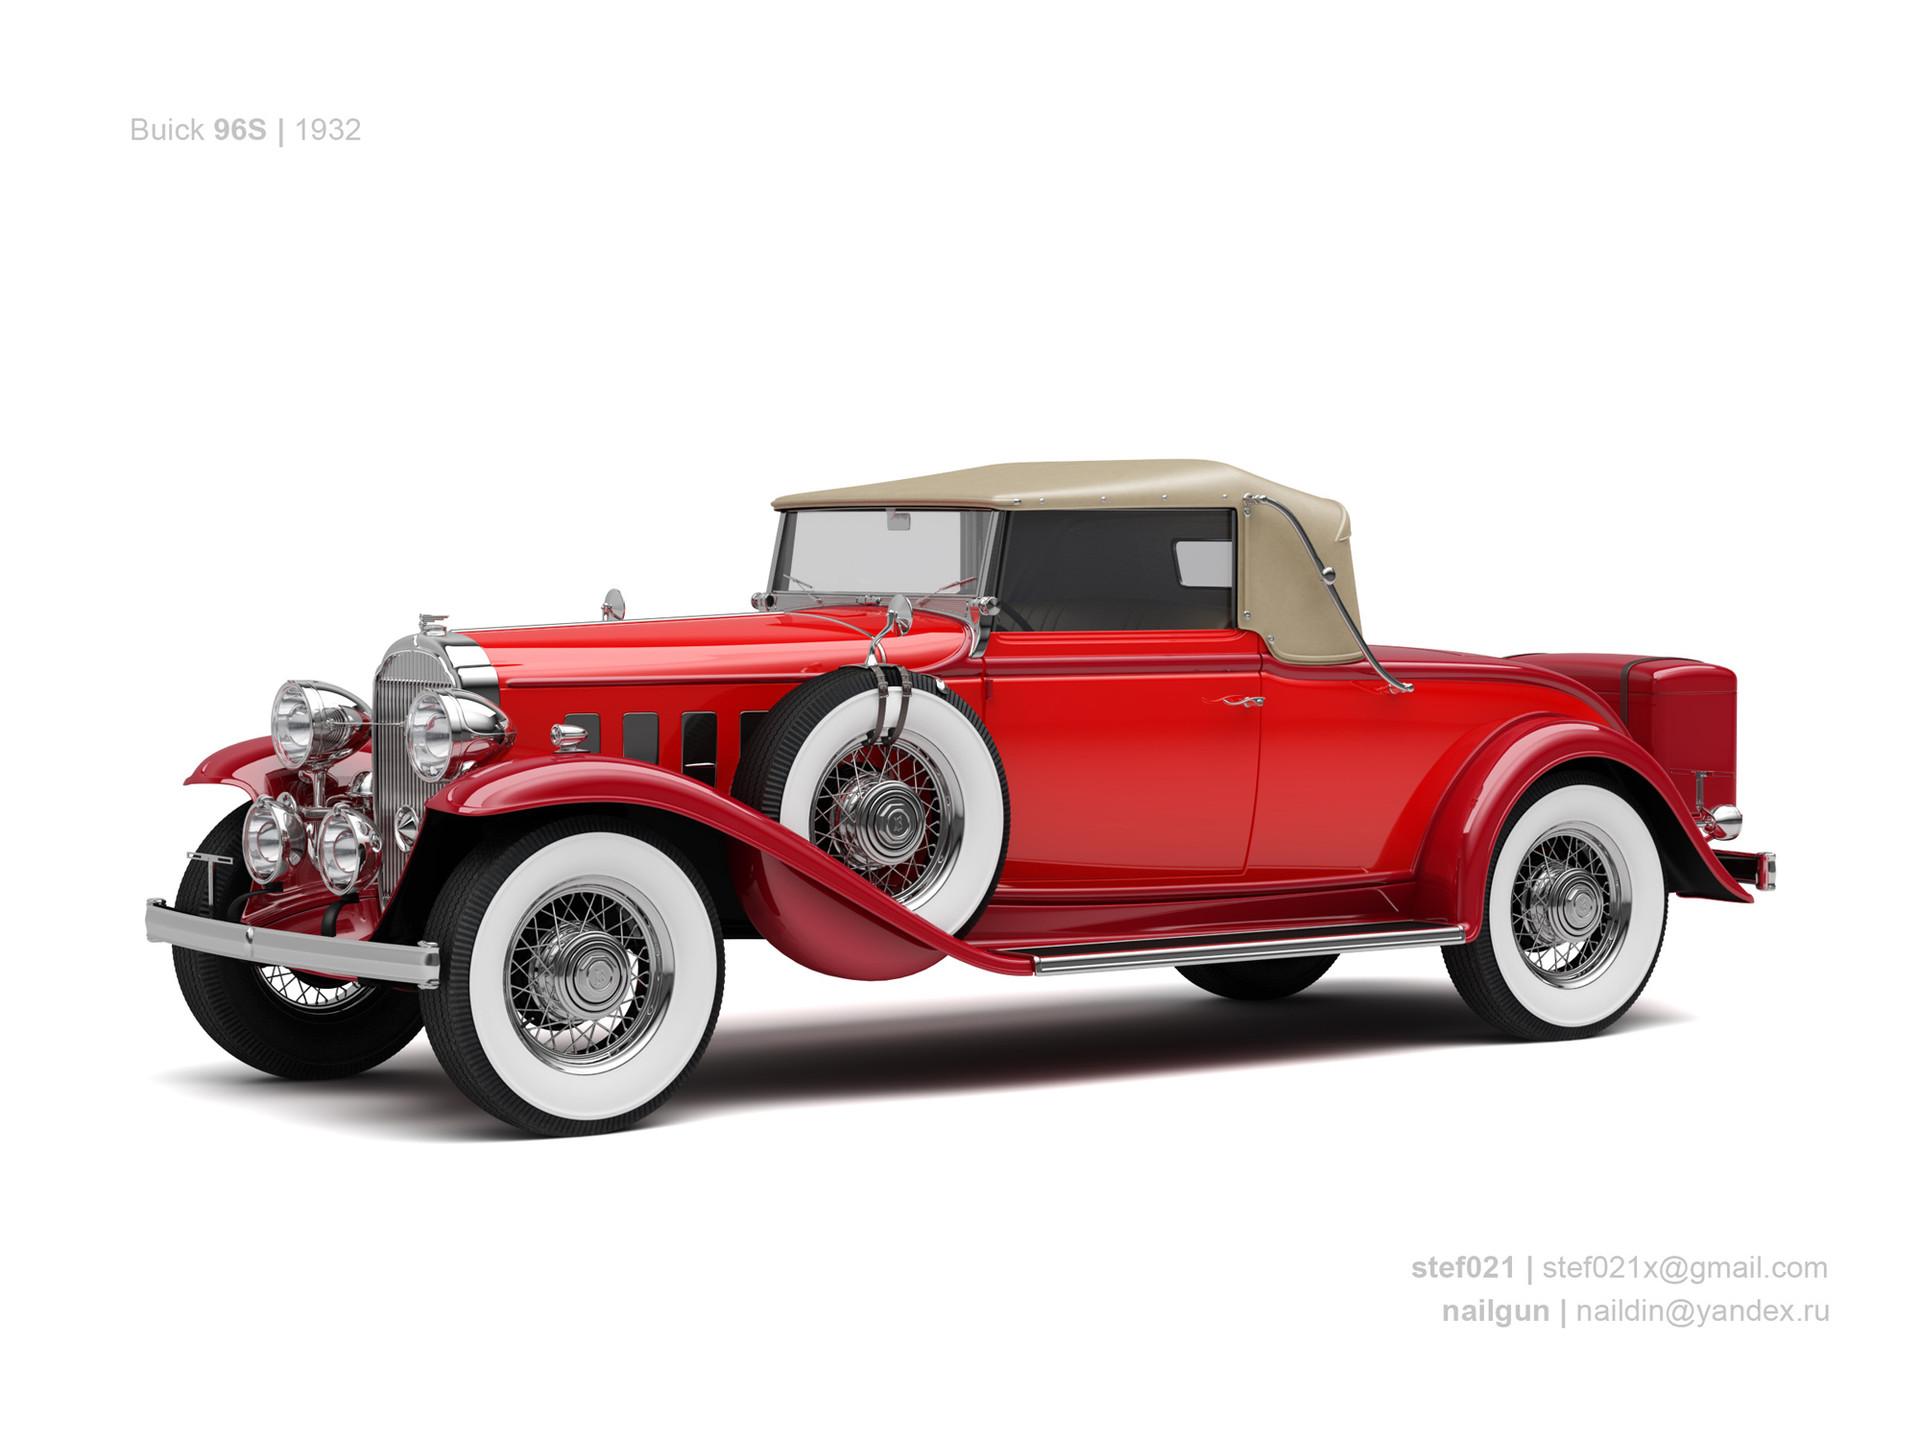 Nail khusnutdinov usa buick 69s 1932 0